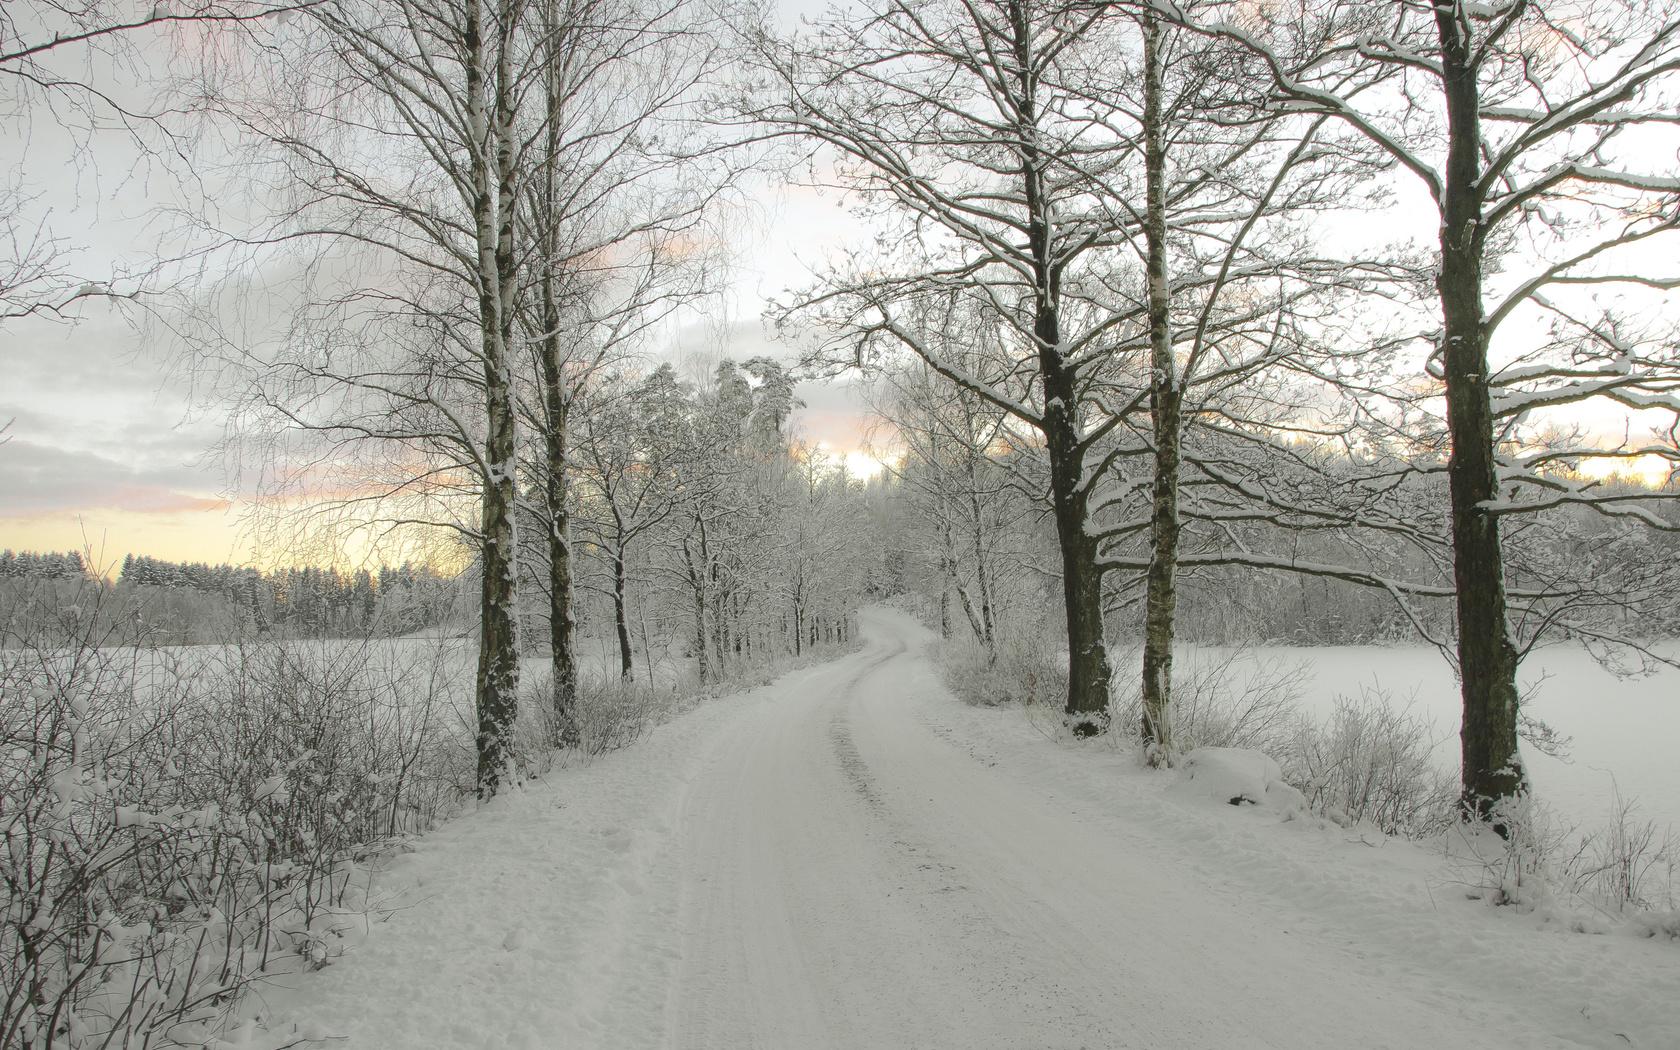 зима, дорога, деревья, закат, пейзаж